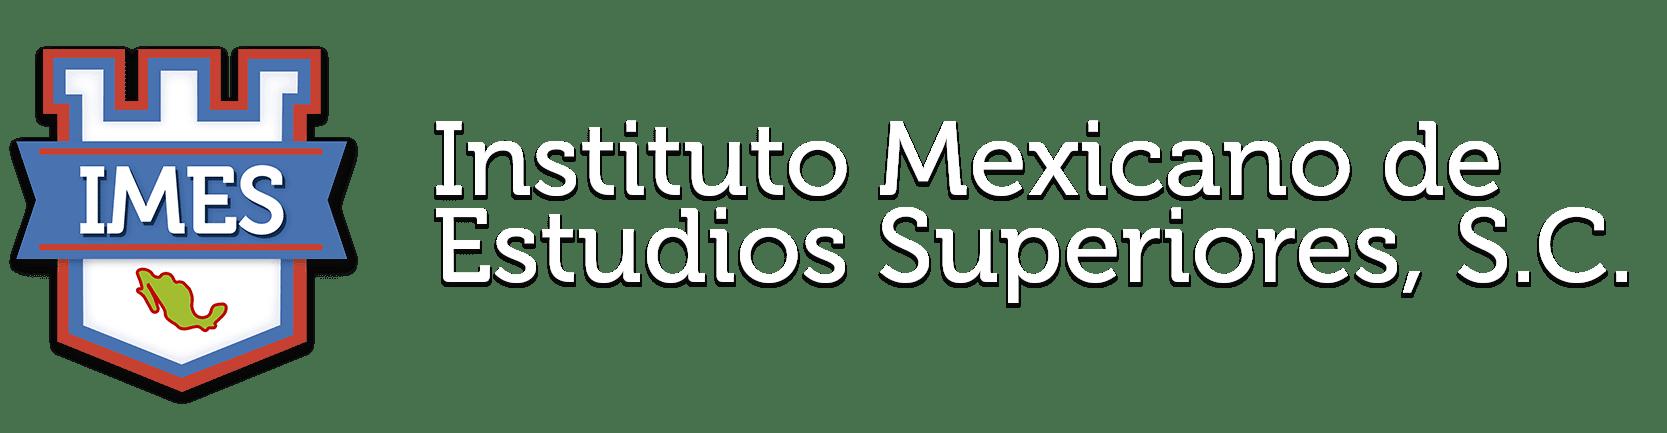 Instituto Mexicano de Estudios Superiores IMES